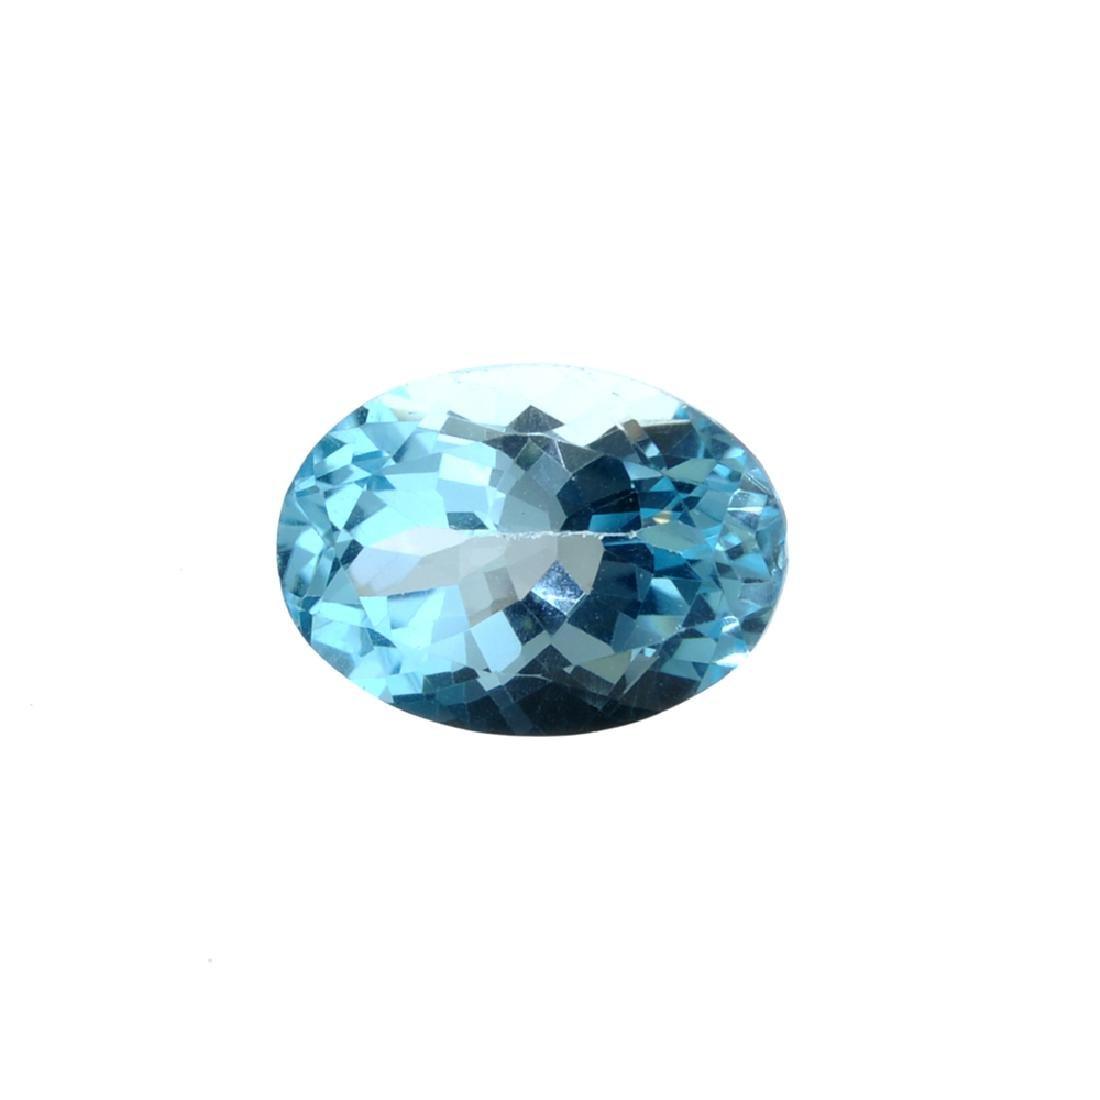 APP: 0.5k 15.75CT Oval Cut Blue Topaz Gemstone